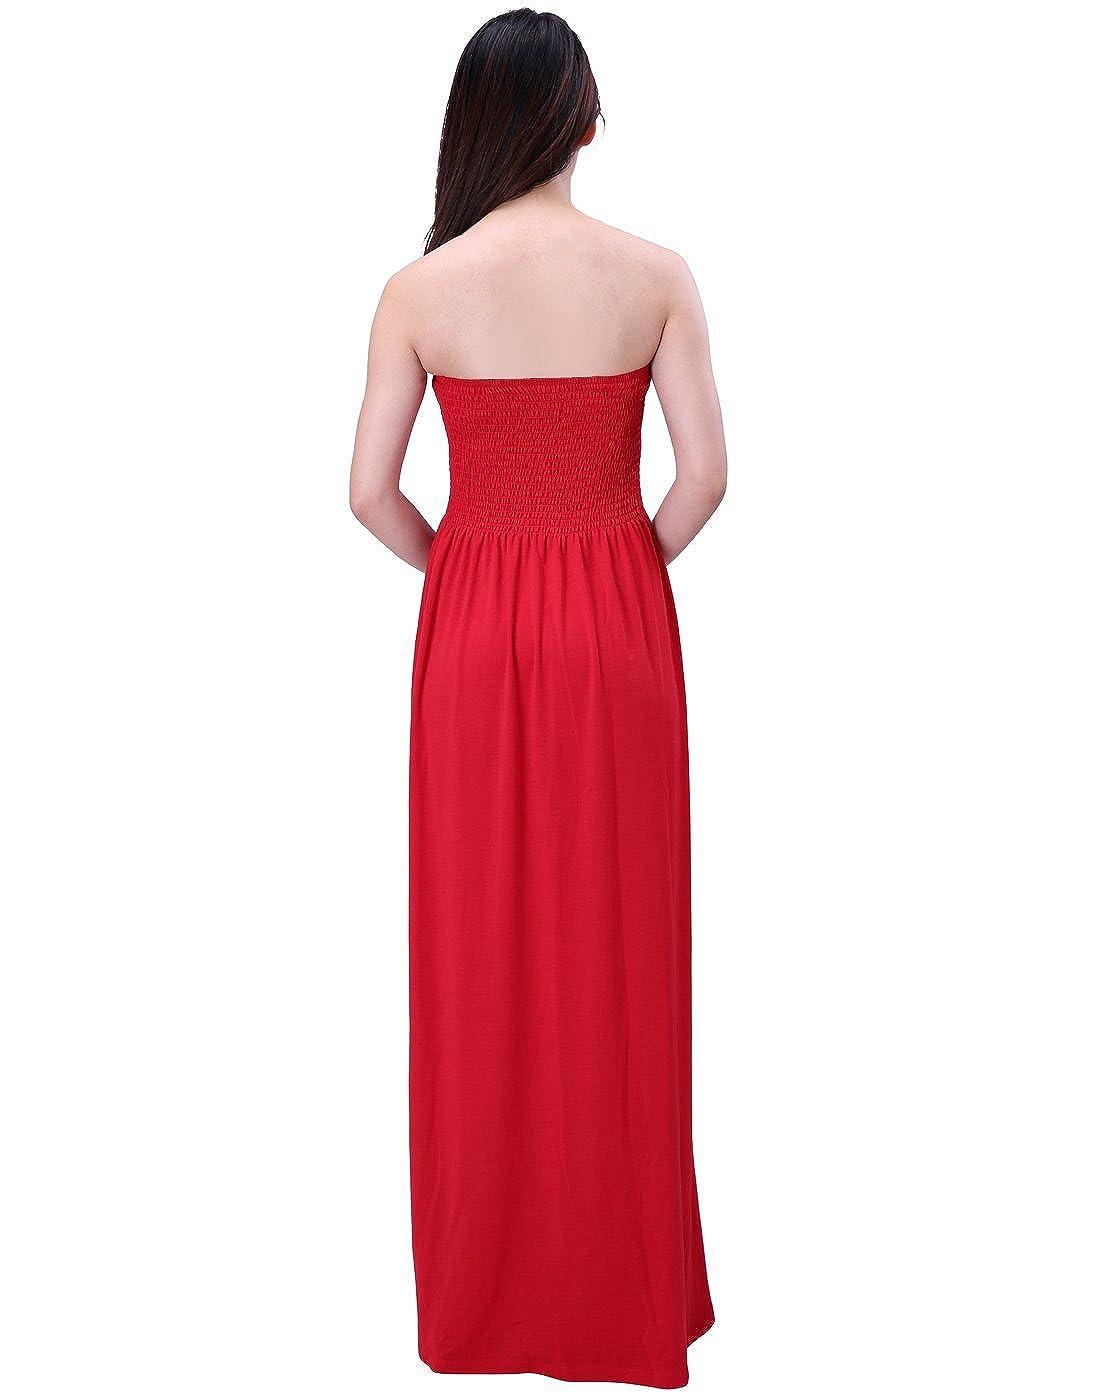 1b068bf474 HDE Women's Strapless Maxi Dress Plus Size Tube Top Long Skirt Sundress  Cover Up larger image